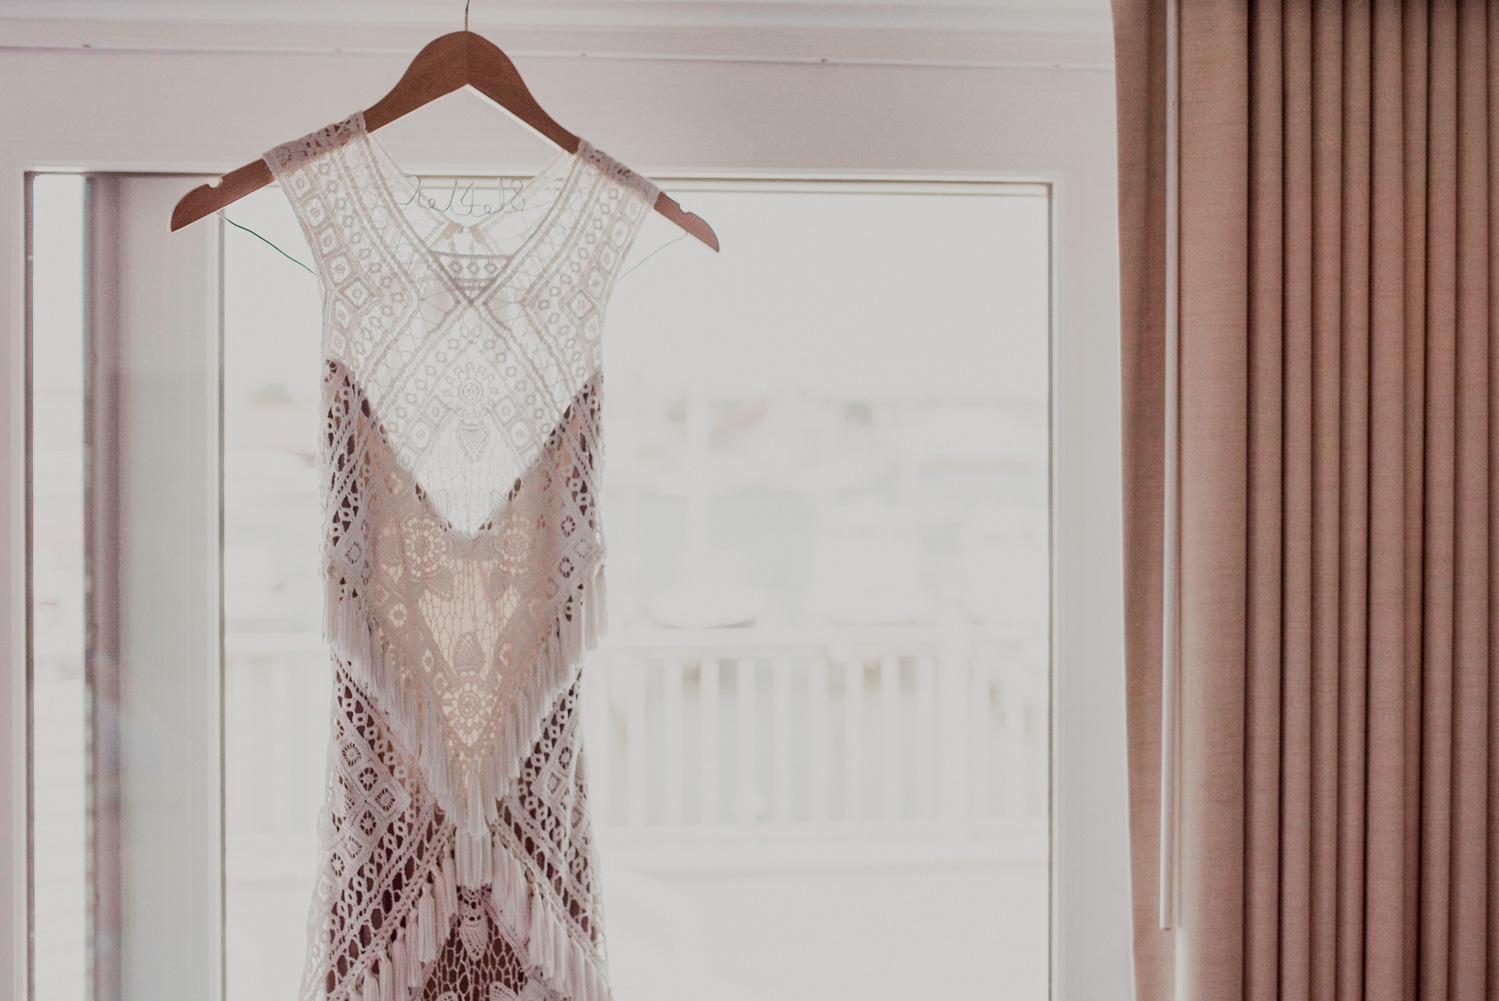 gorgeous rue de seine dress hanging in hotel room before wedding